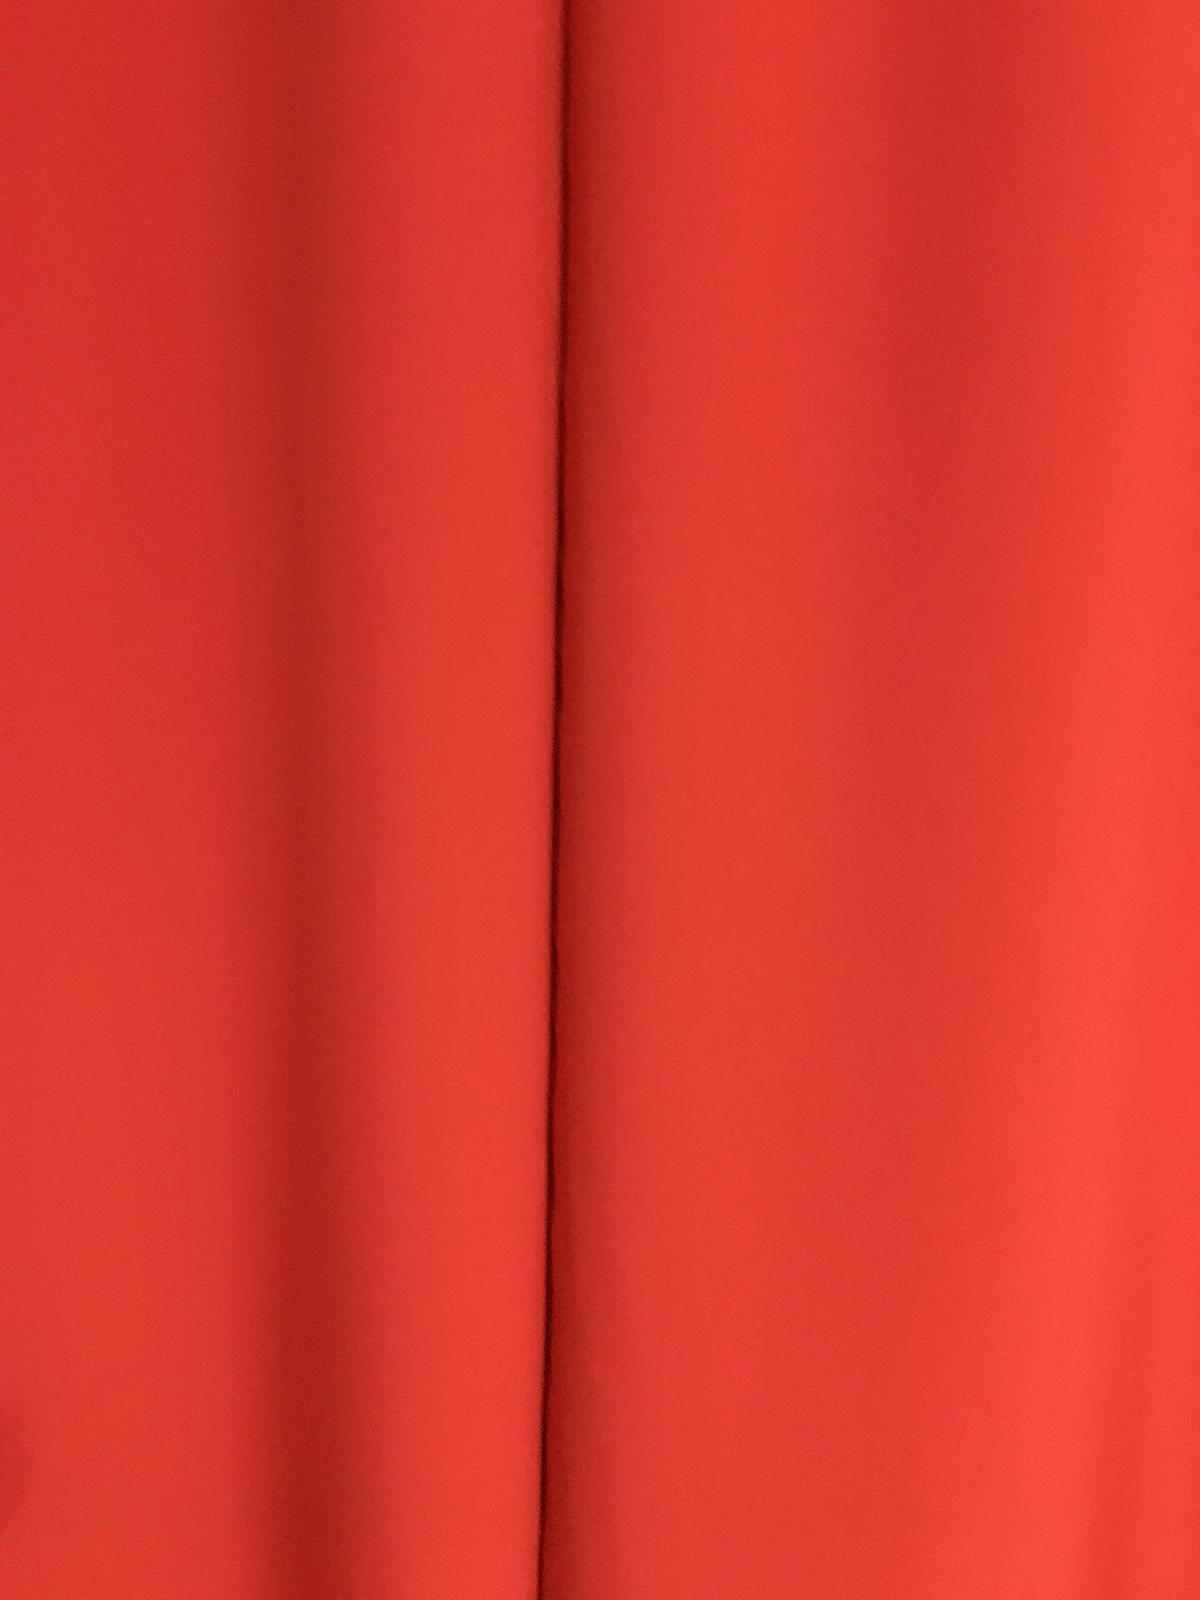 Tieniaci cerveny zaves so zirkonmi - Obrázok č. 2